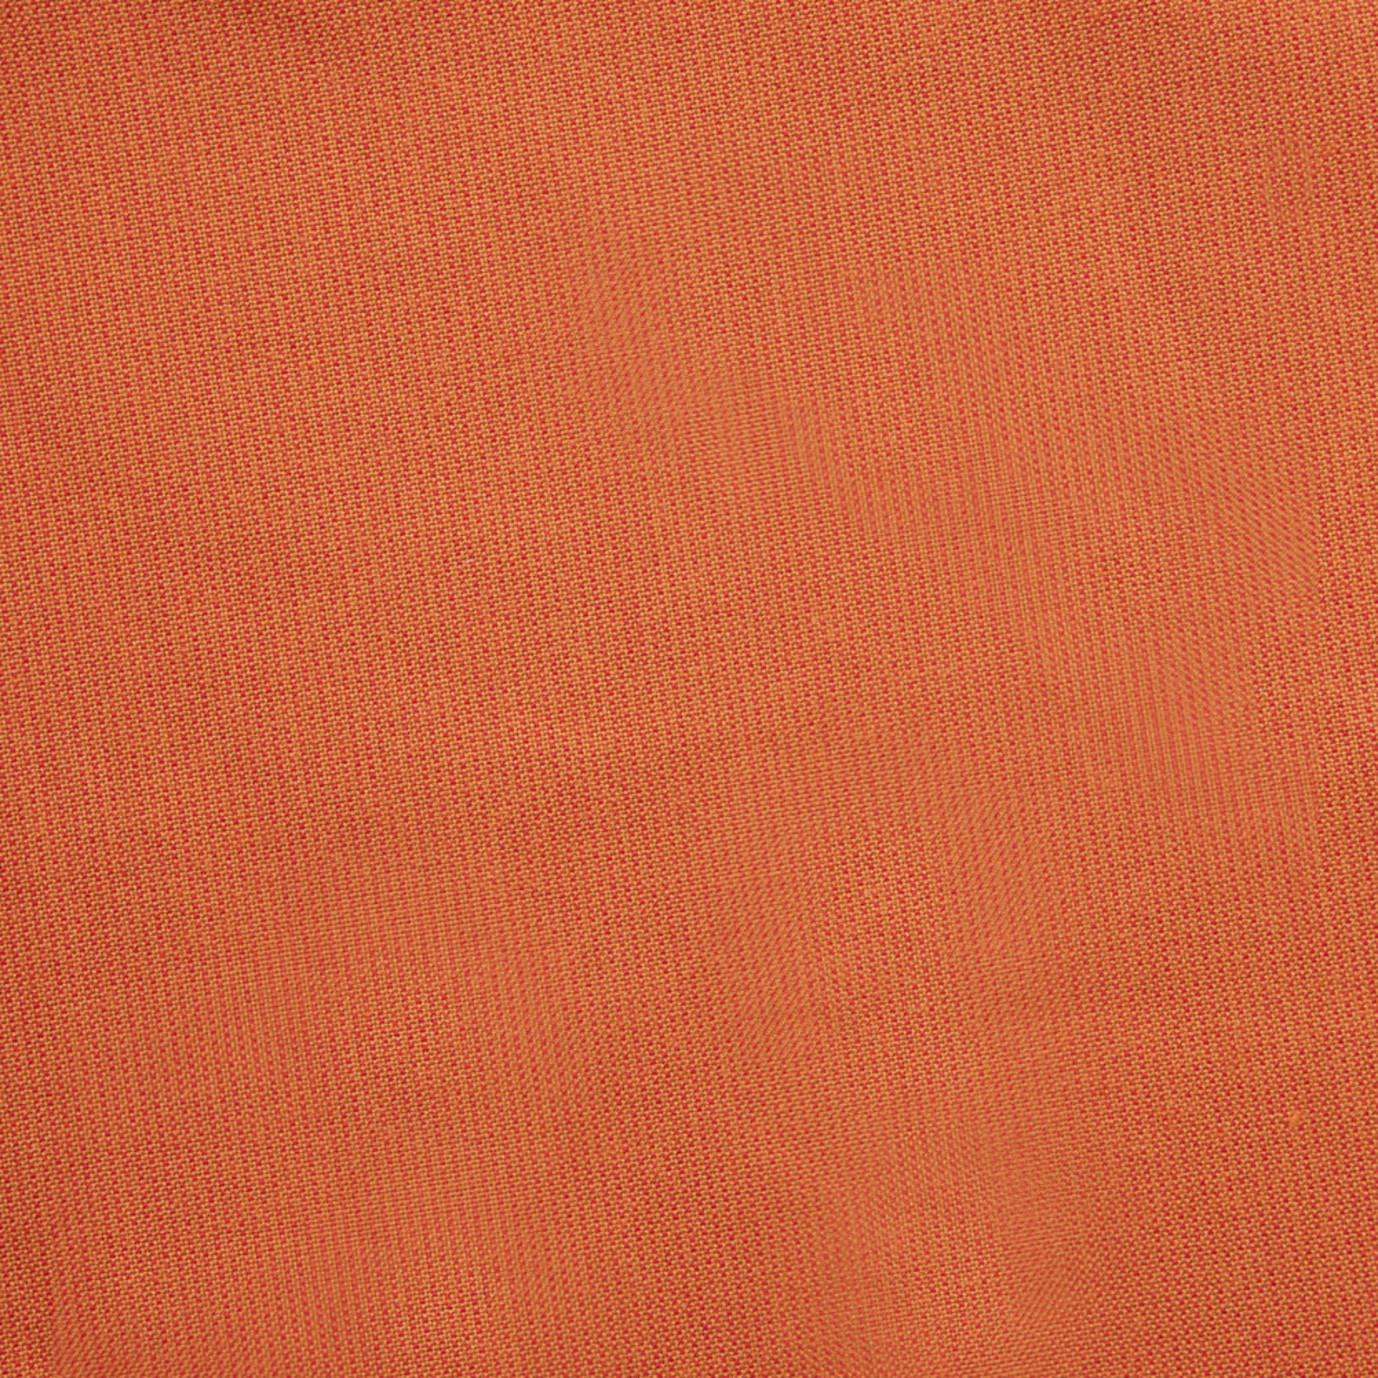 Cannes™ Club Ottomans - Tikka Orange